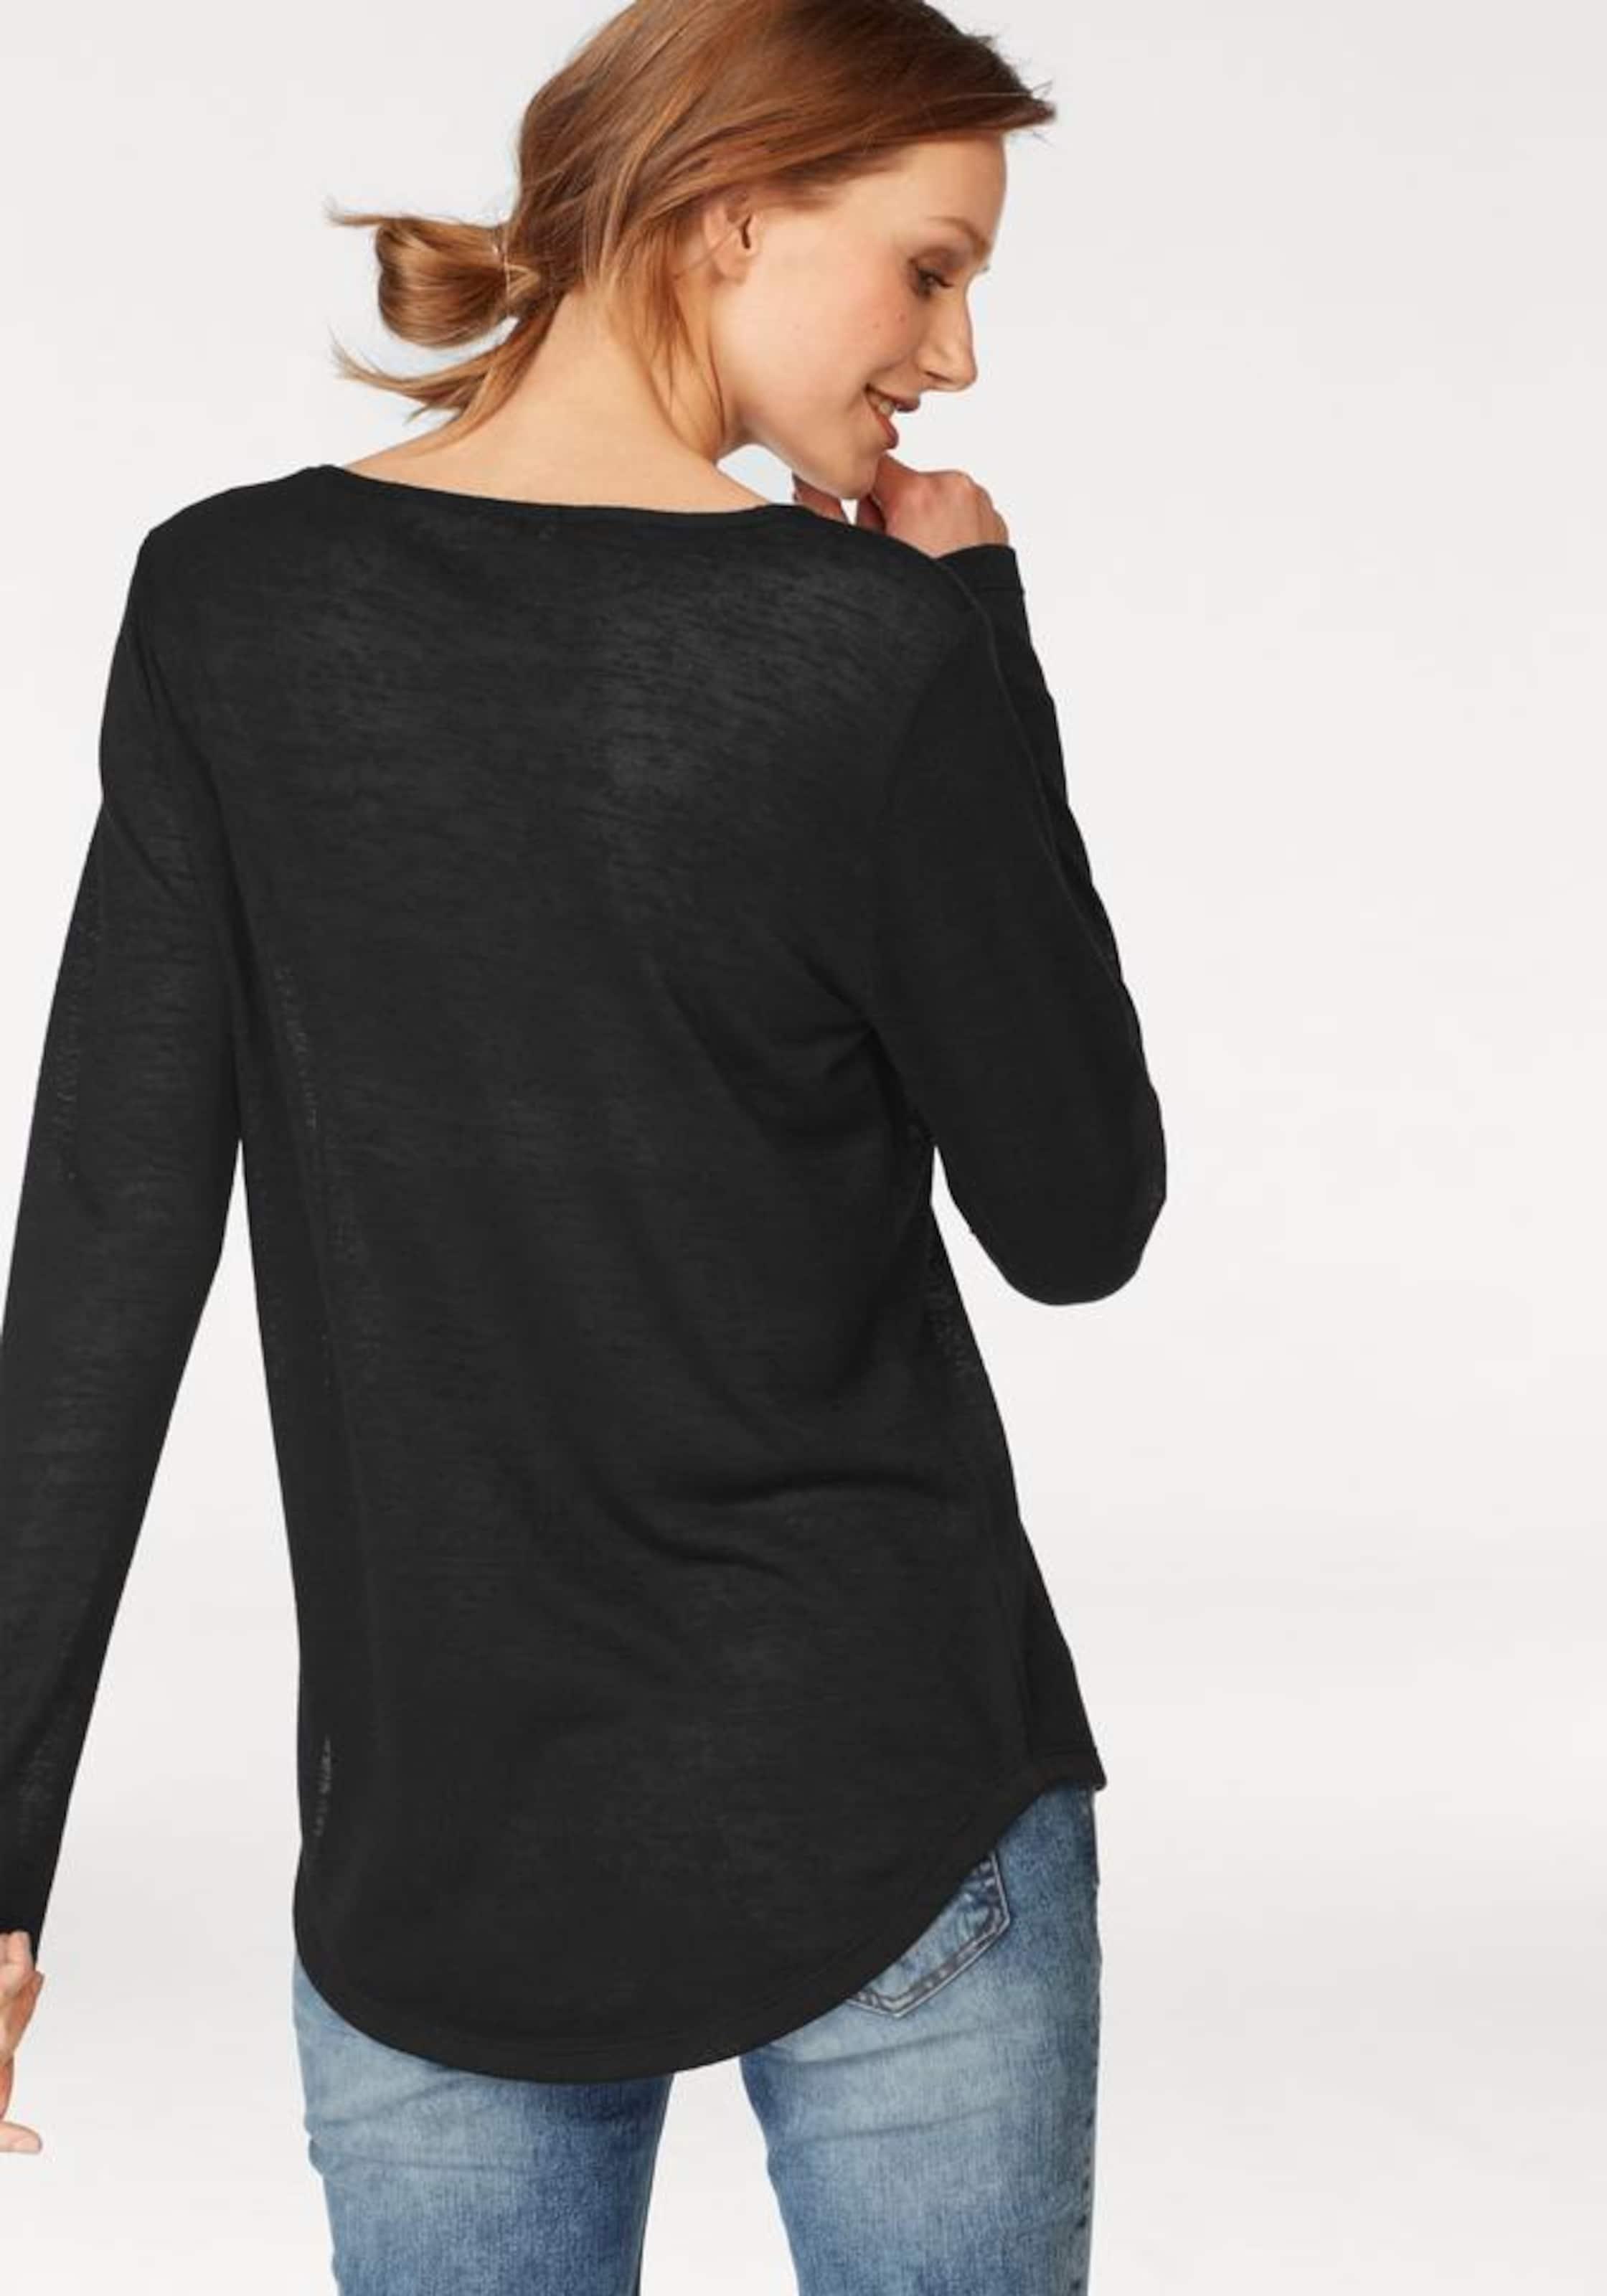 Auslass 100% Original TAMARIS Pullover Rabatt Großhandelspreis Offiziell vrxiYo8tGL